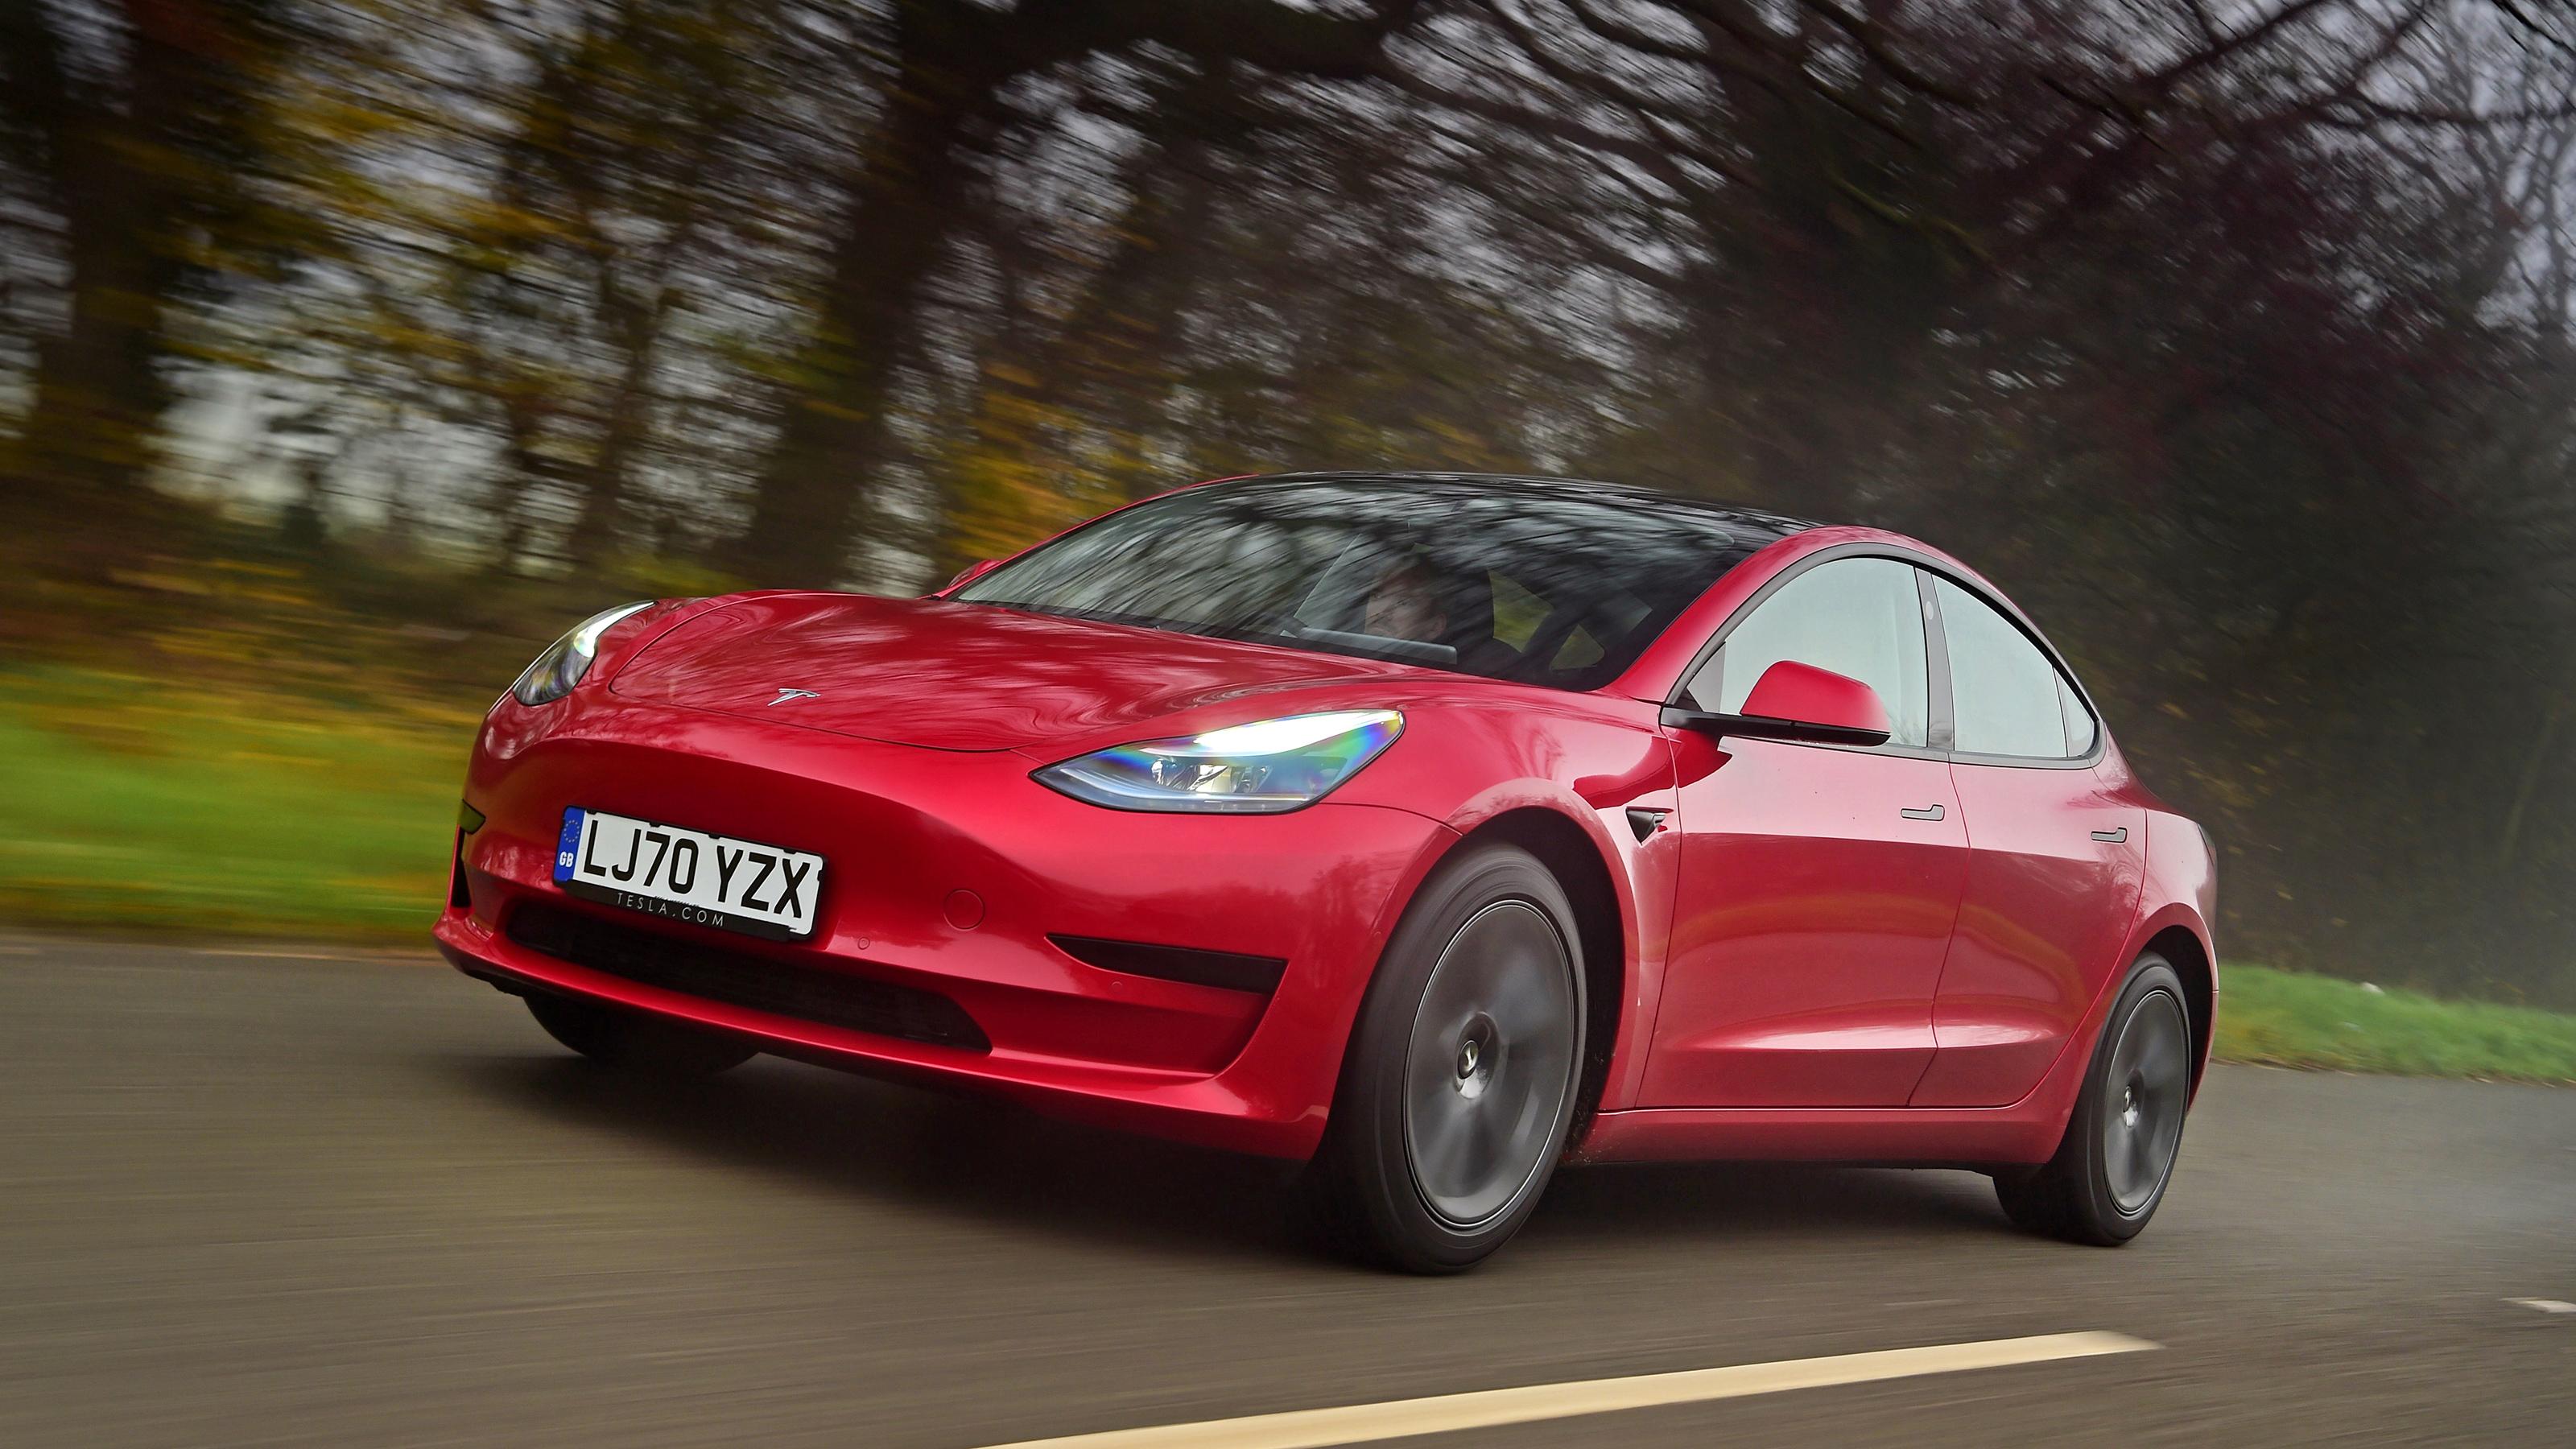 New Tesla Model 3 Standard Range Plus 2020 review | Auto ...